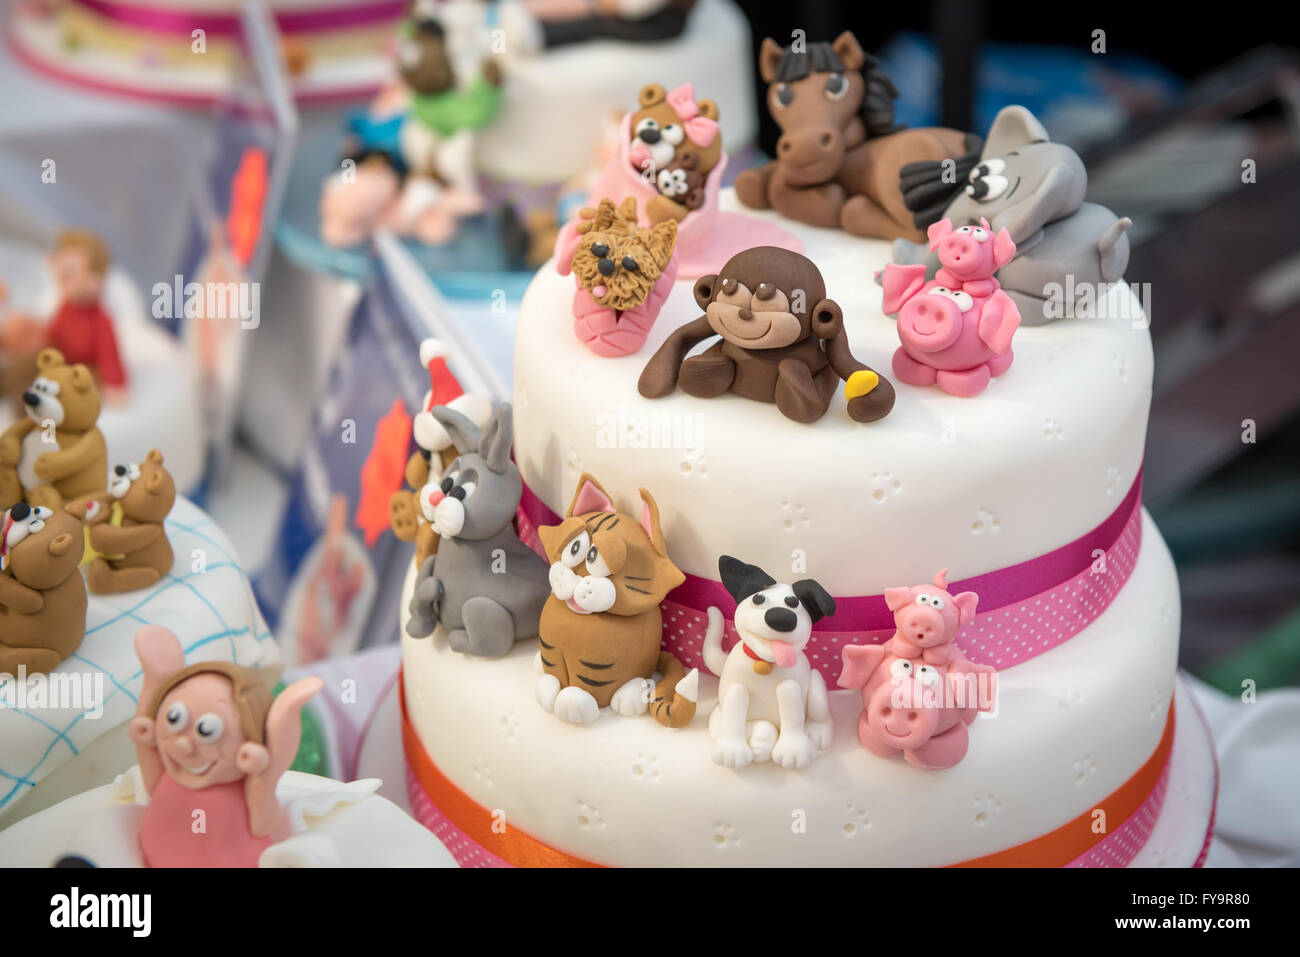 Animal shape birthday cakes decorations Cake International The